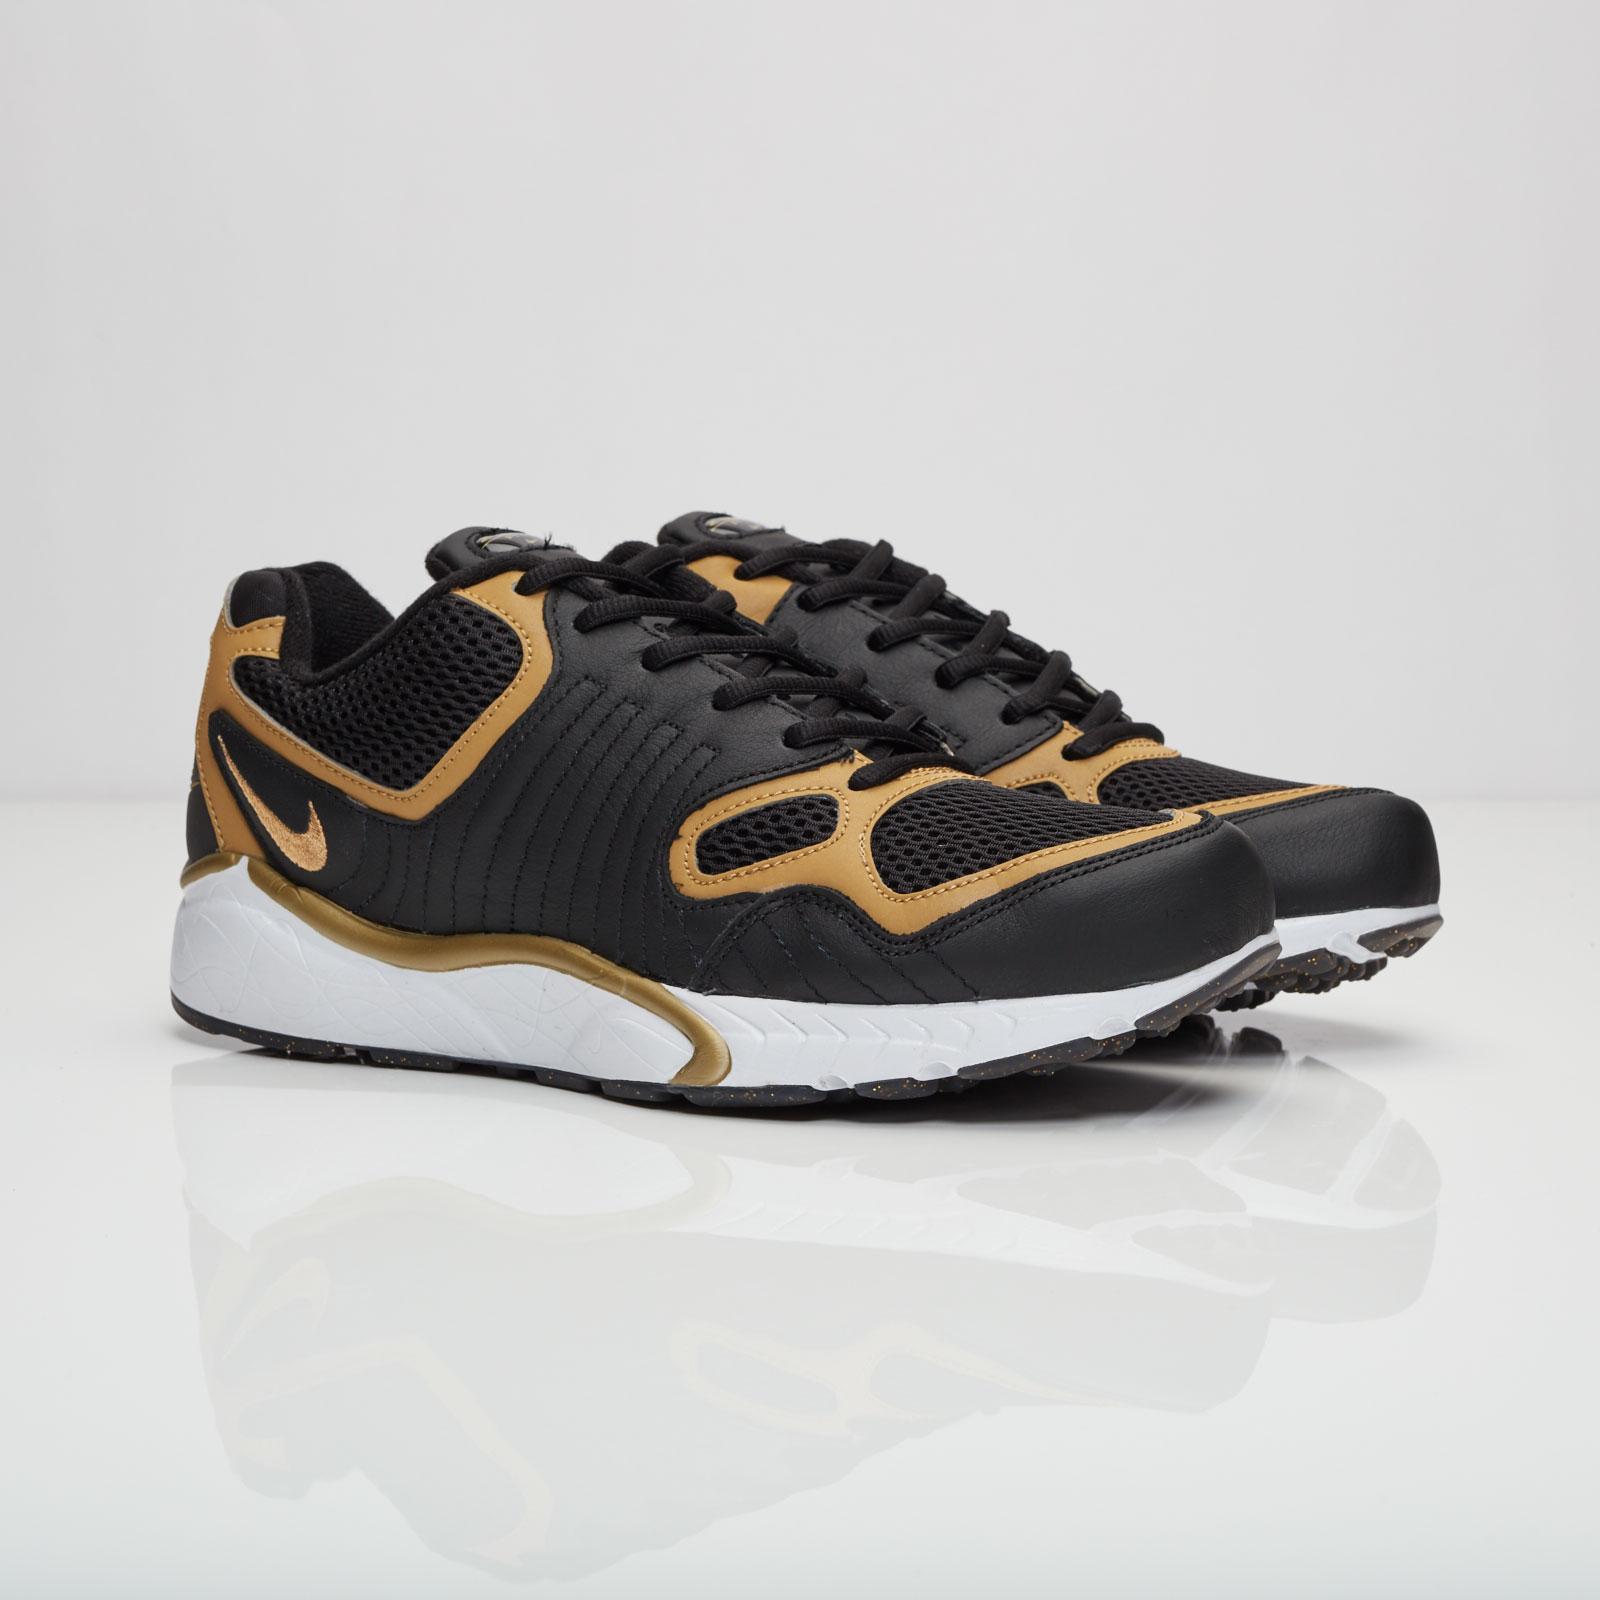 6c2dc46fc1 Nike Air Zoom Talaria 16 - 844695-077 - Sneakersnstuff | sneakers ...